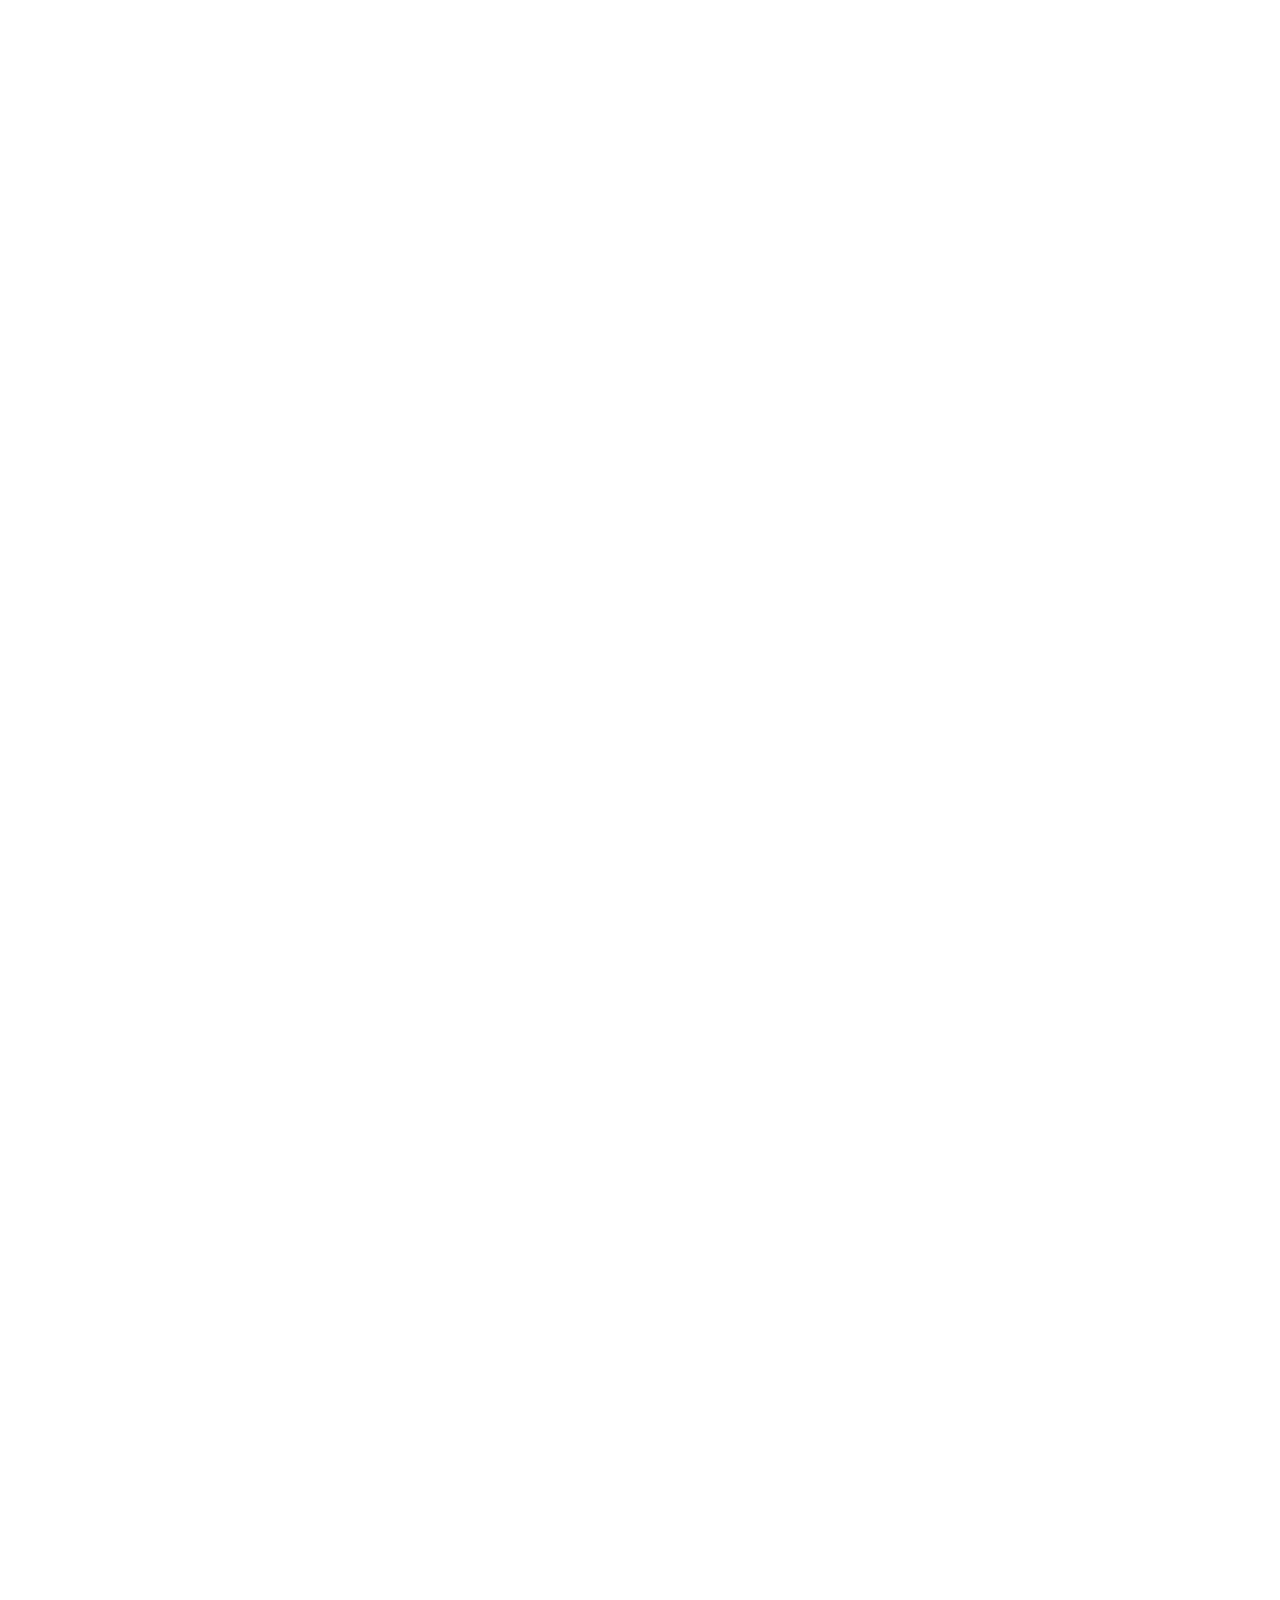 KALONISE Standard Profile Arch Top 3/4's Lite Decorative Glass Double Iron Door – KALONISE OID-6080-KAL1PAT